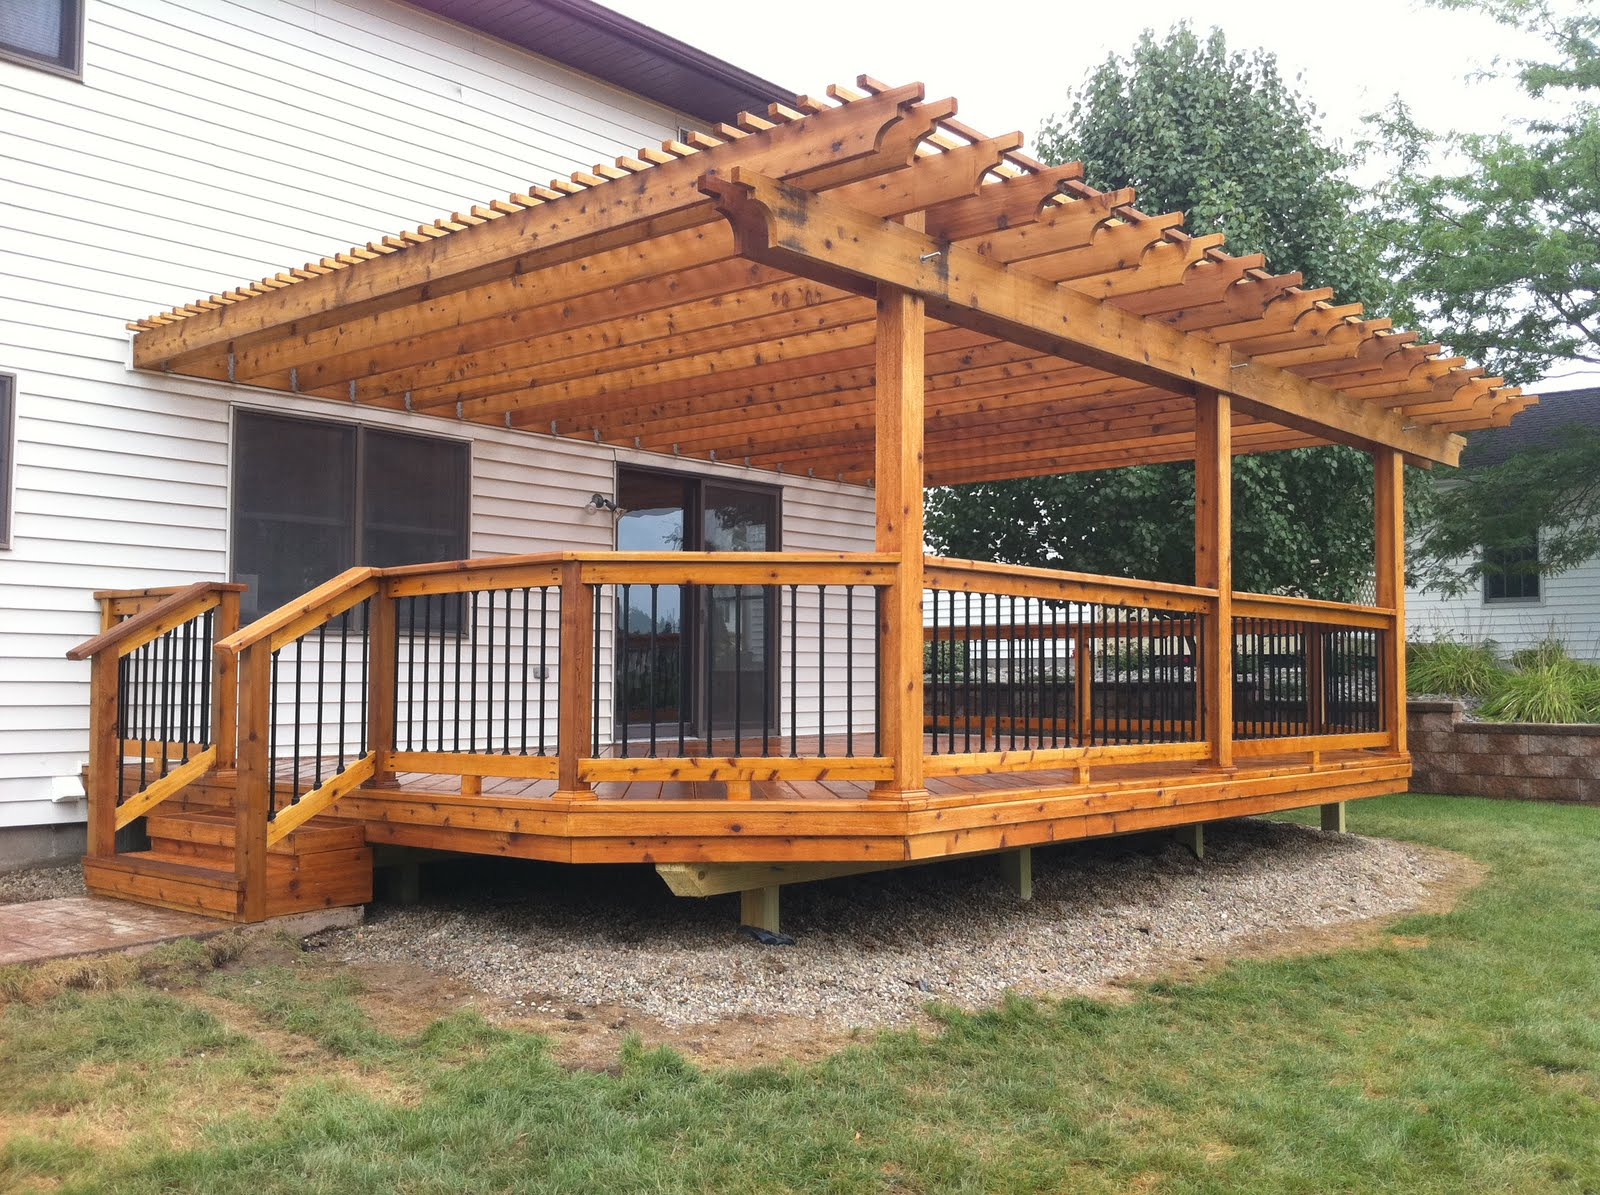 cedar wood decks in michigan | Autumnwoodconstruction's Blog on Backyard Wood Patio Ideas id=63863